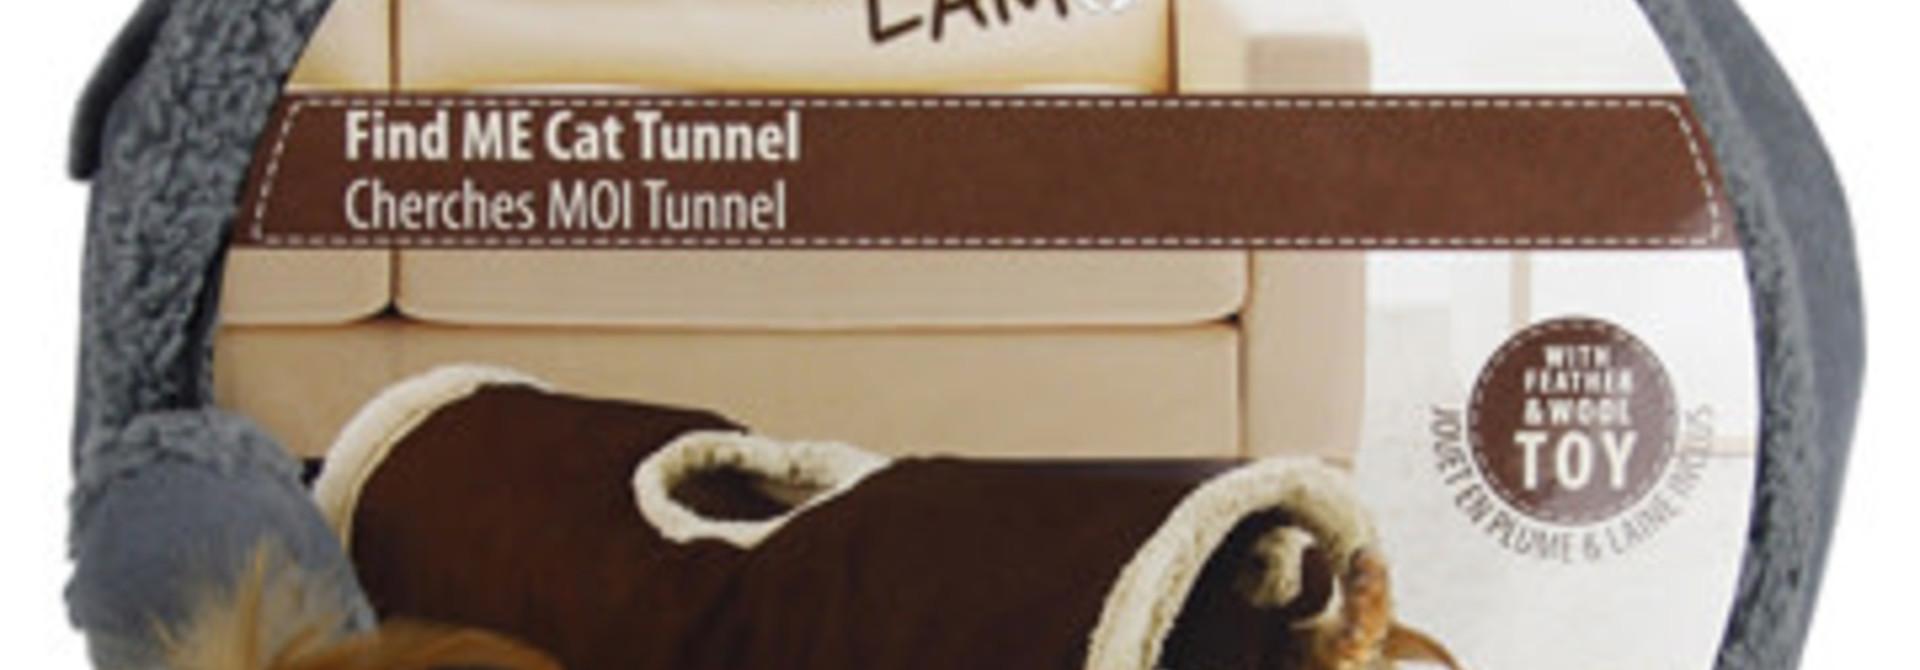 AFP Find Me Cat Tunnel